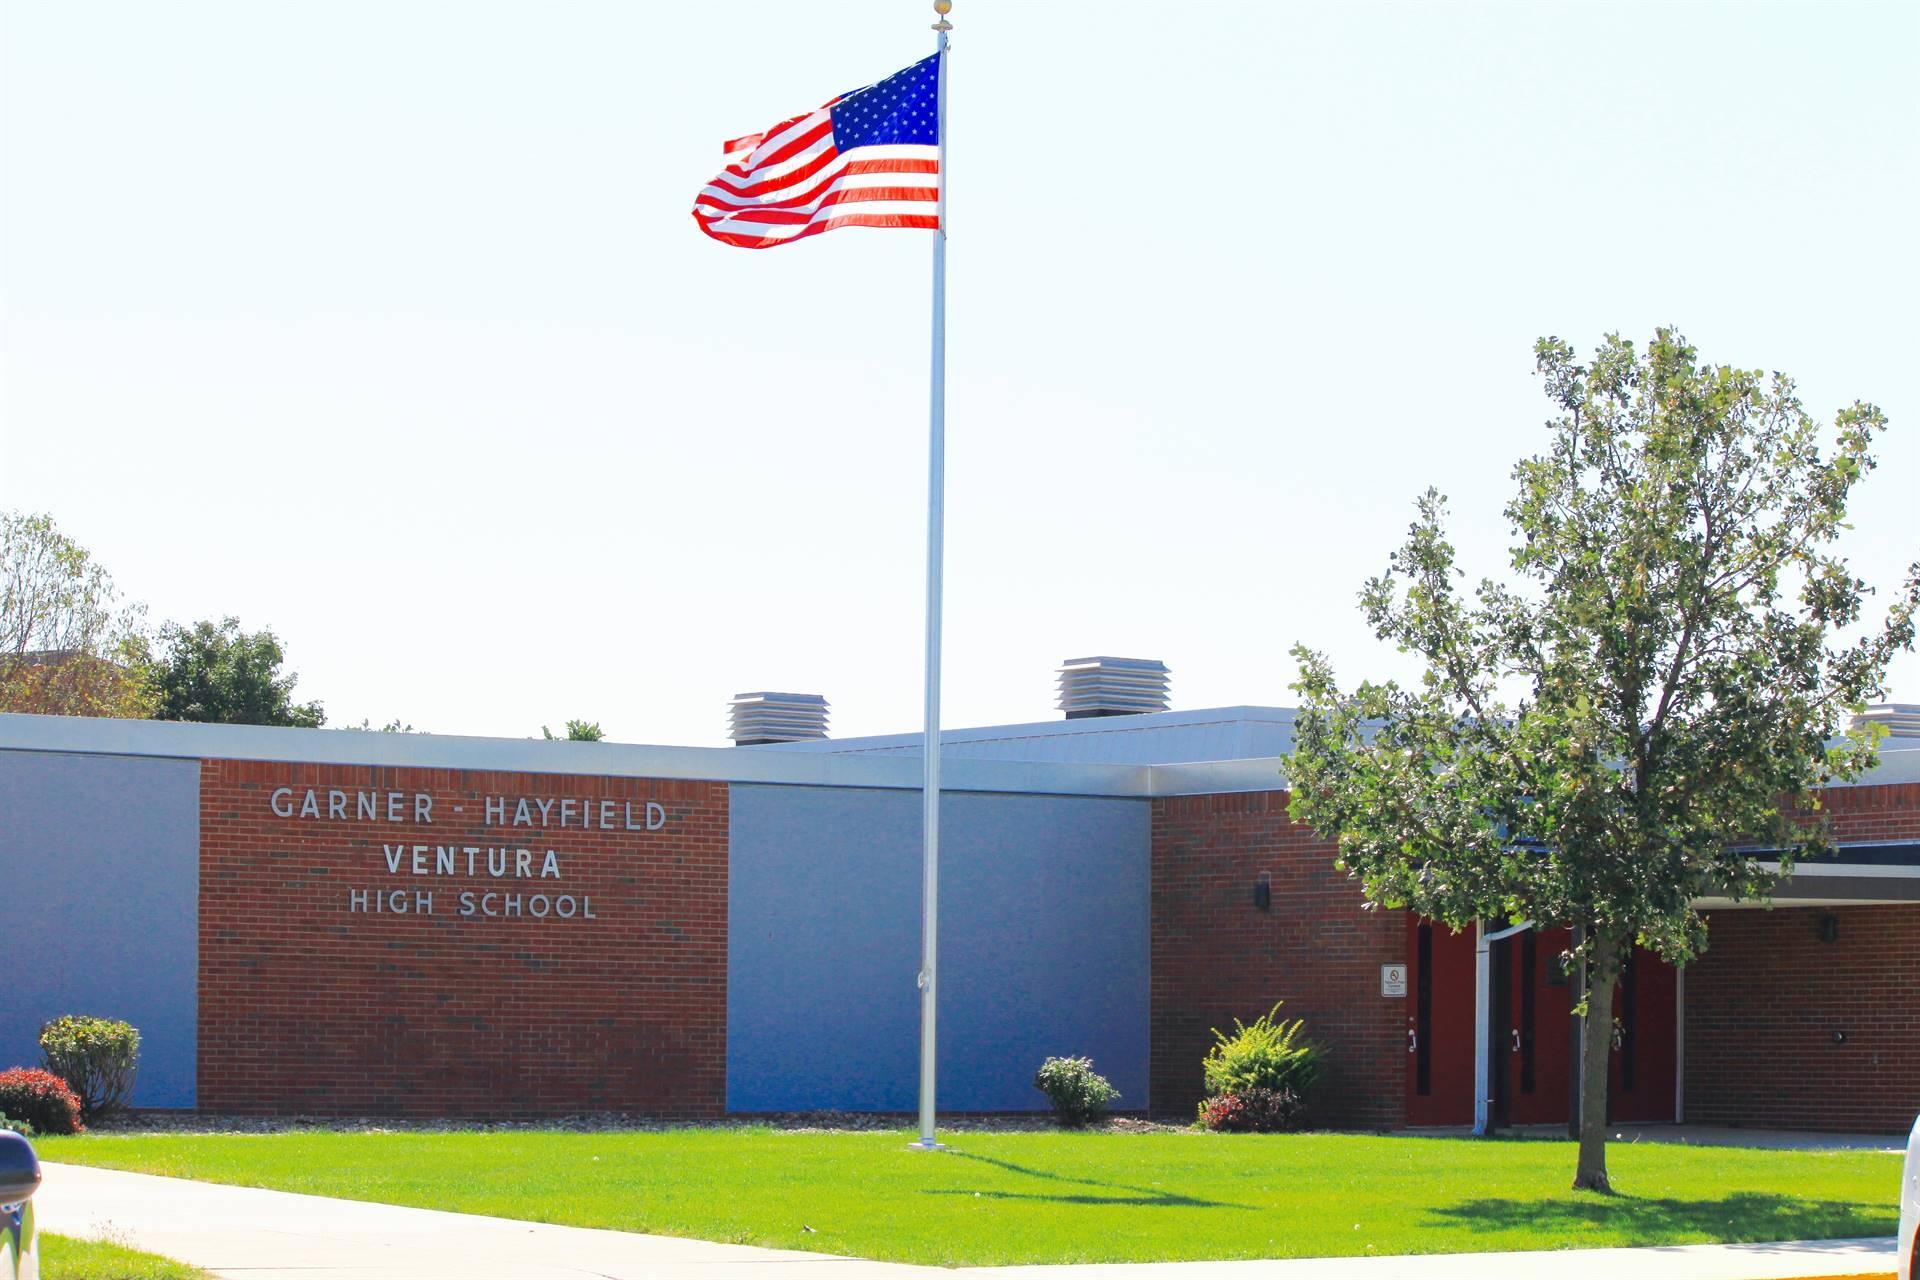 GHV High School building